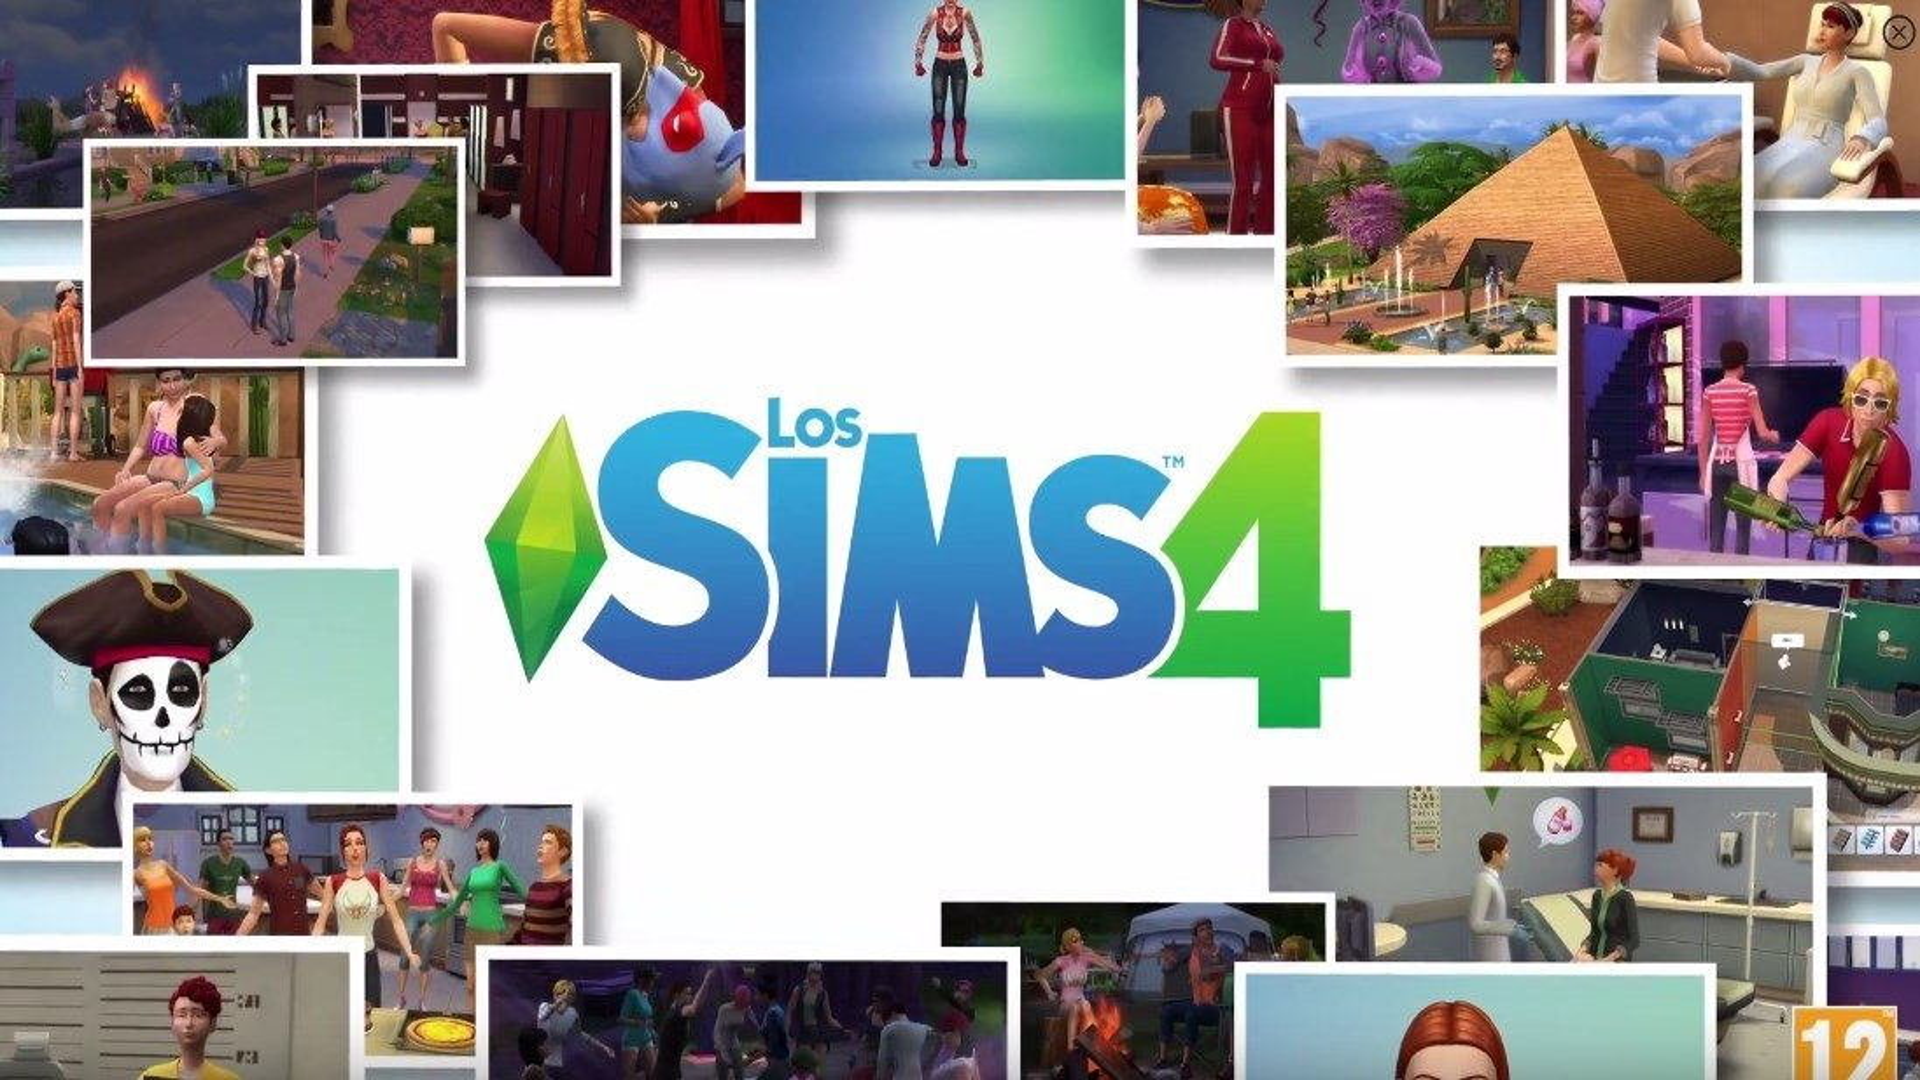 Les Sims 4 Mac image 4